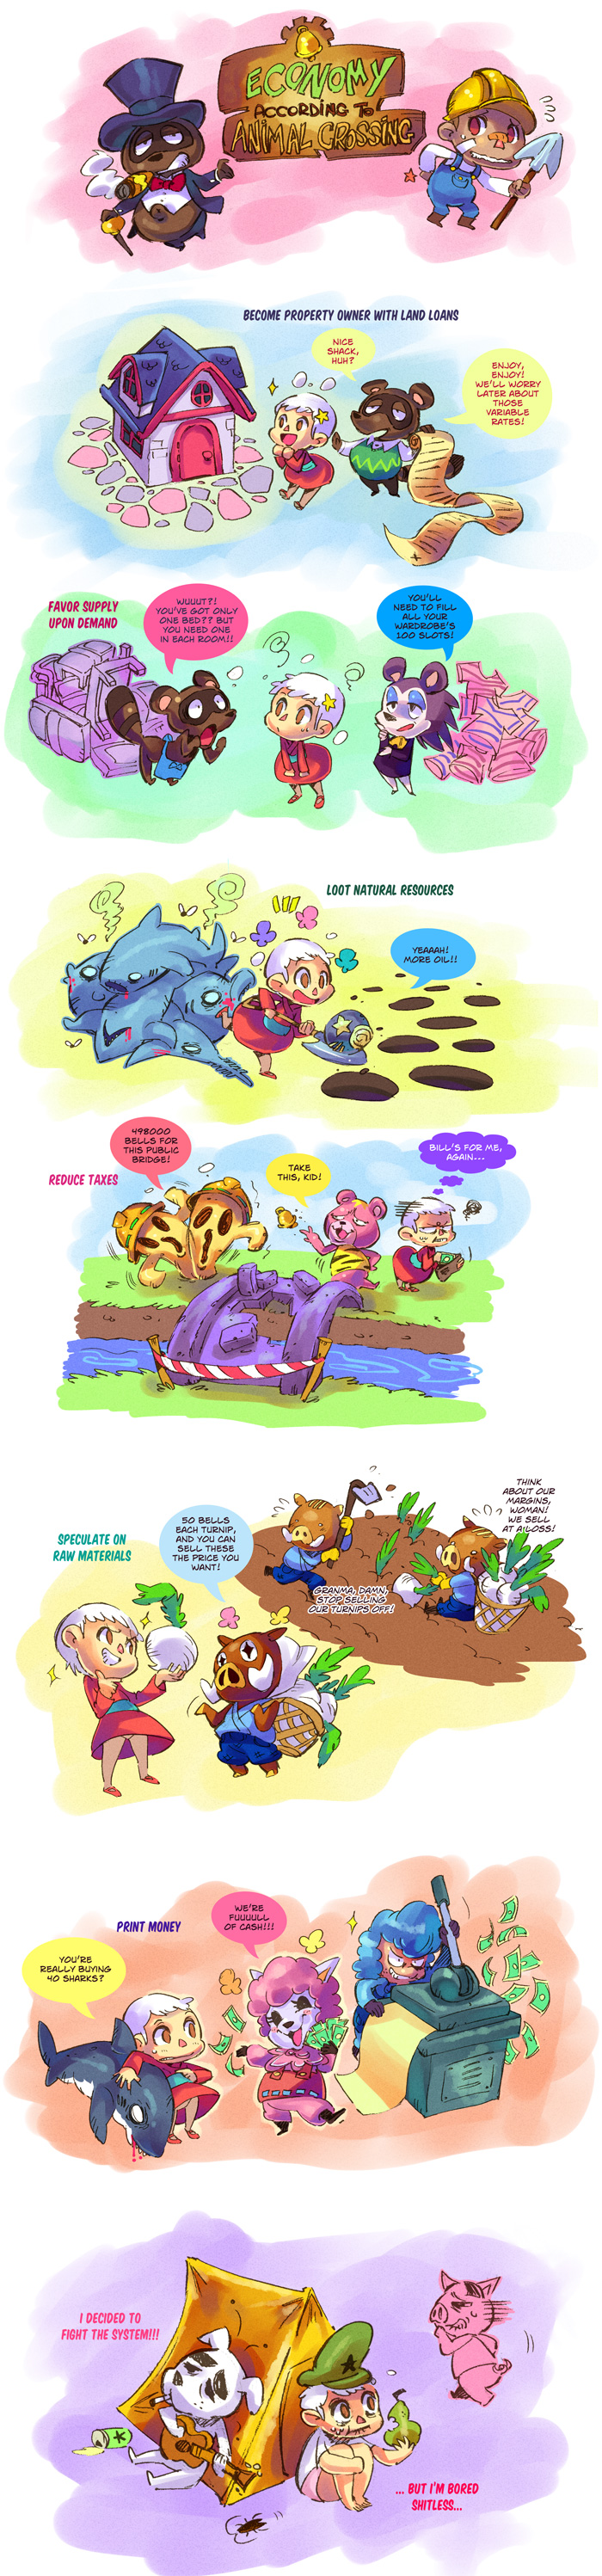 Animal Crossing Economy lessons by Rafchu